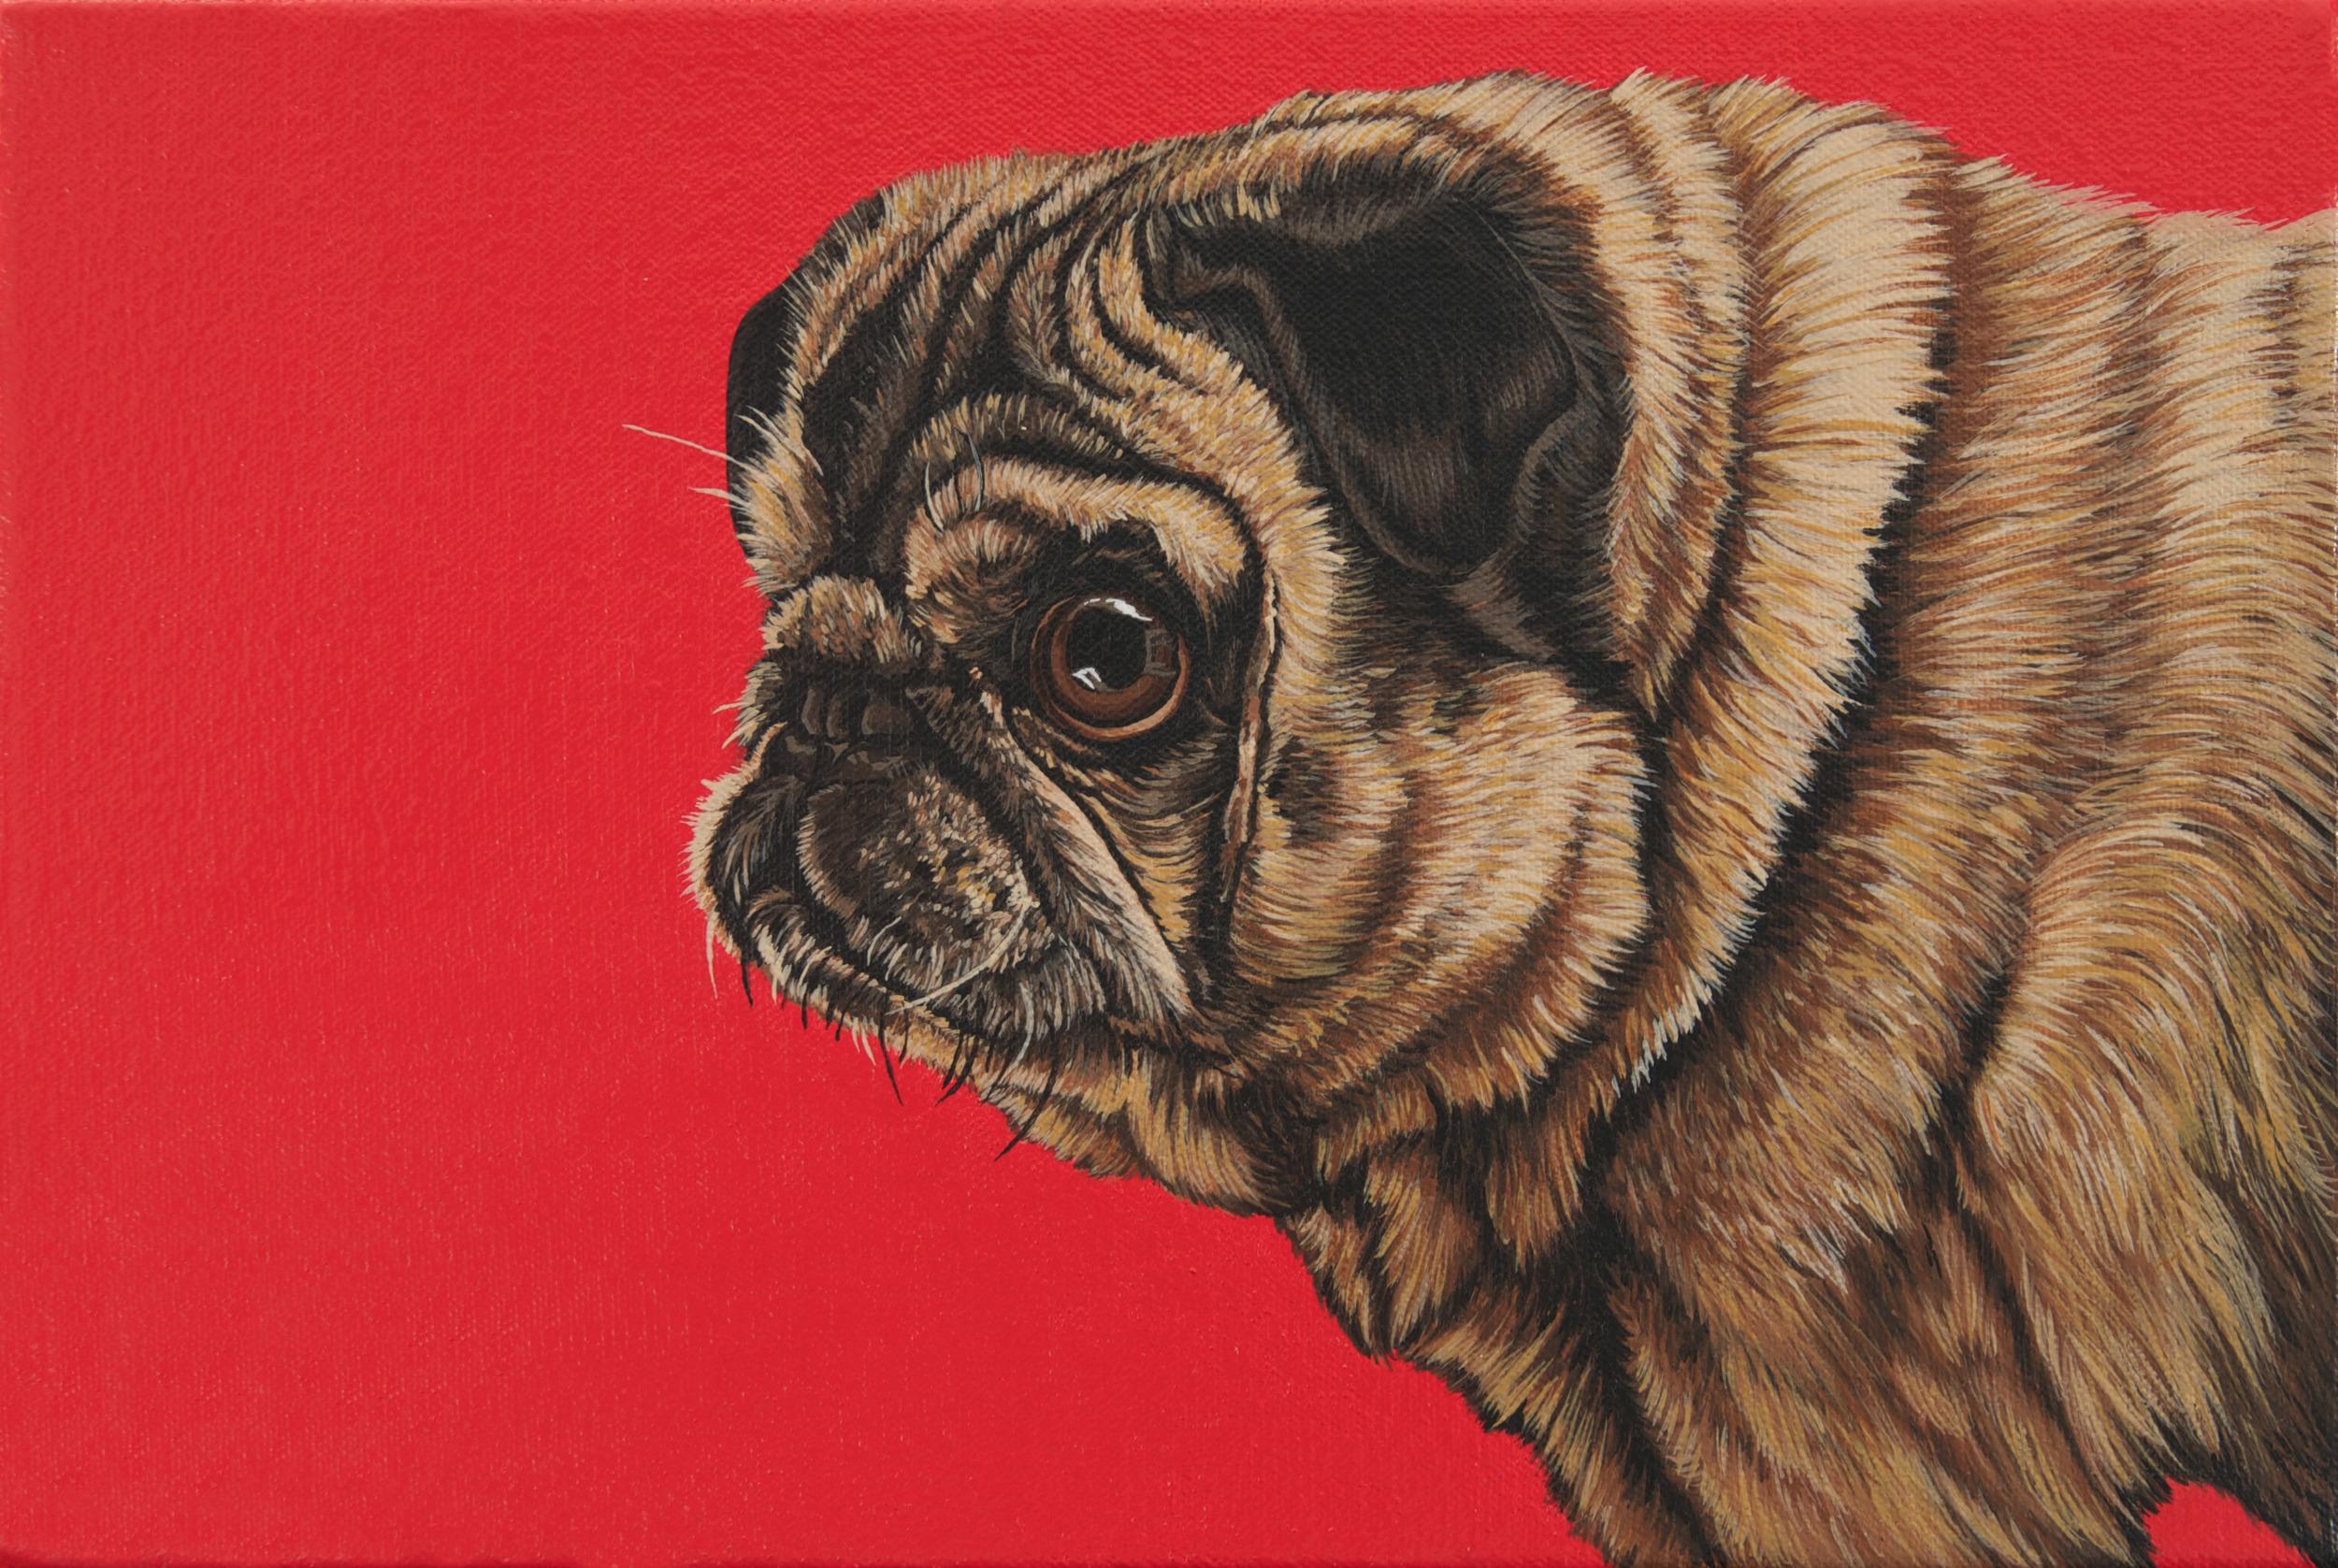 """The Rare Pugerpillar"", latex enamel on canvas, 8""x 10"", 2013"